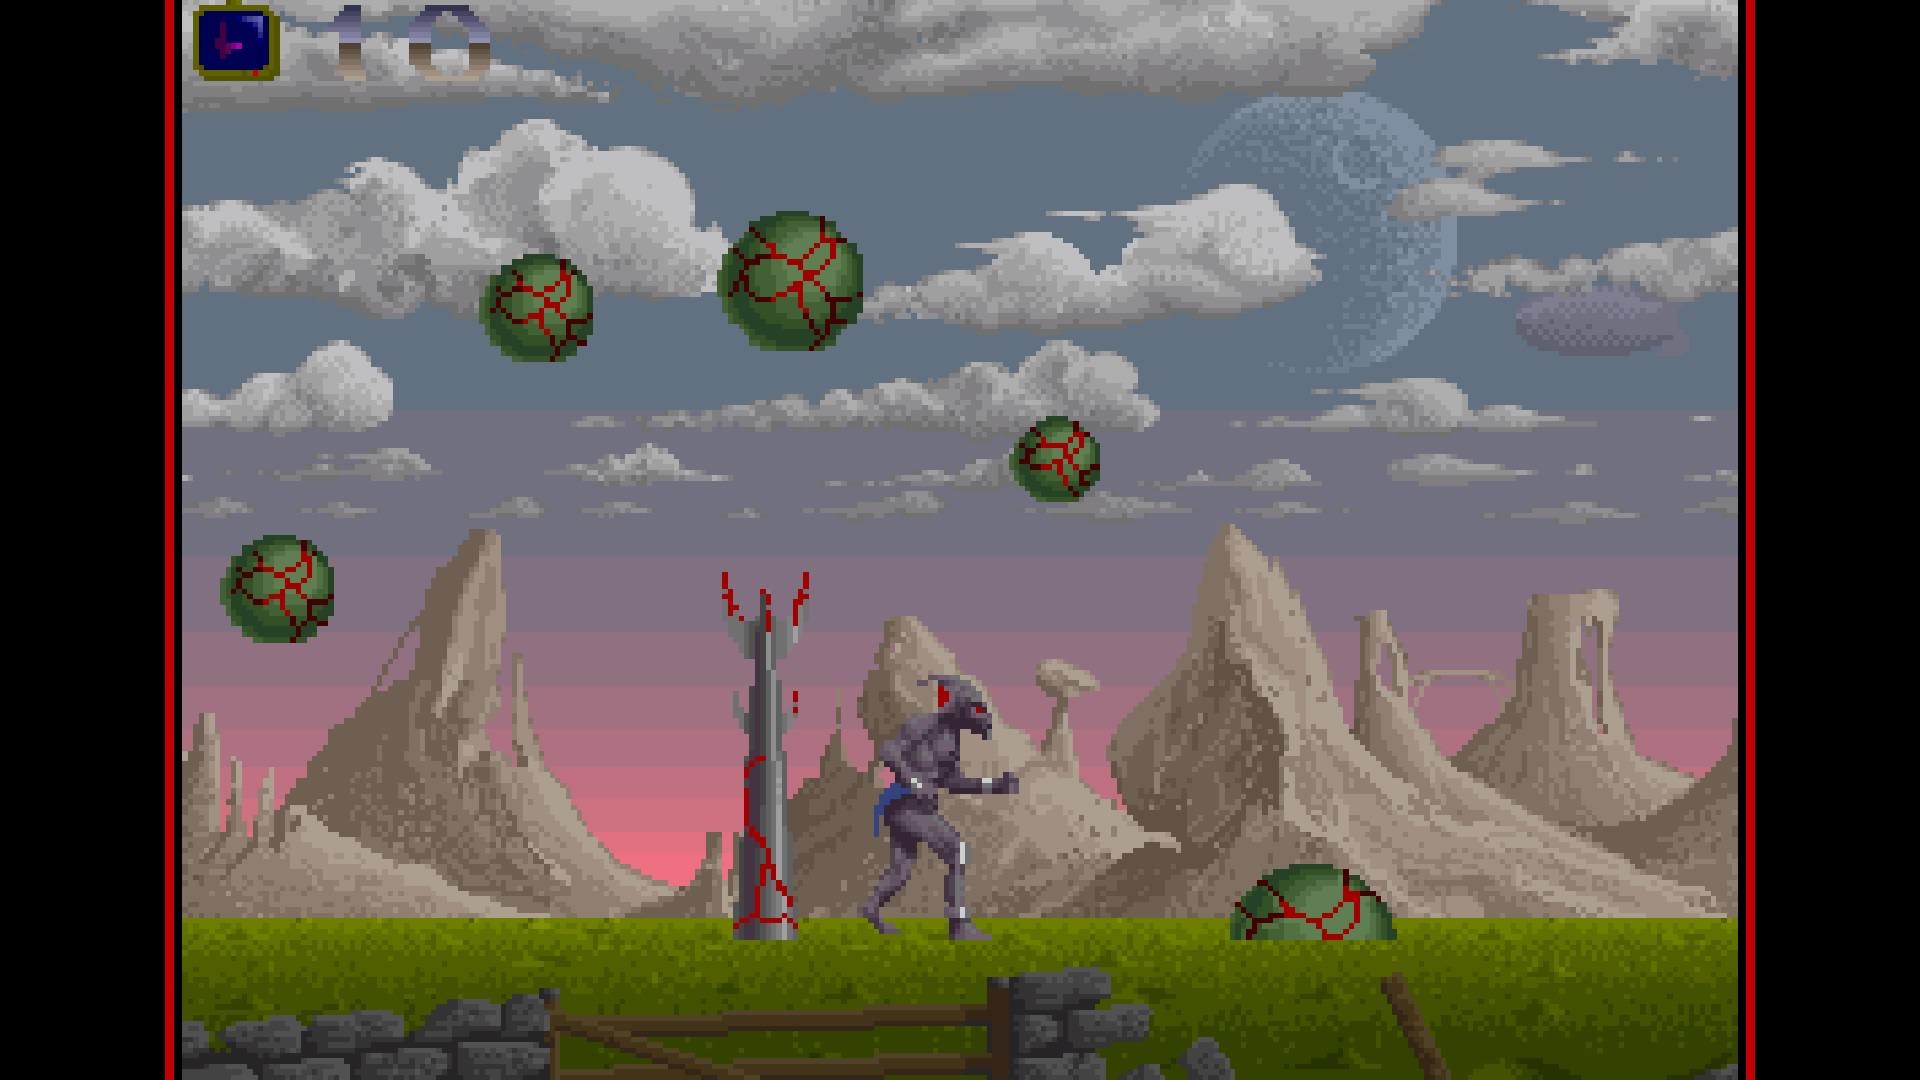 Shadow of the Beast, l'originale del 1989 emulato su PS4 all'interno del reboot